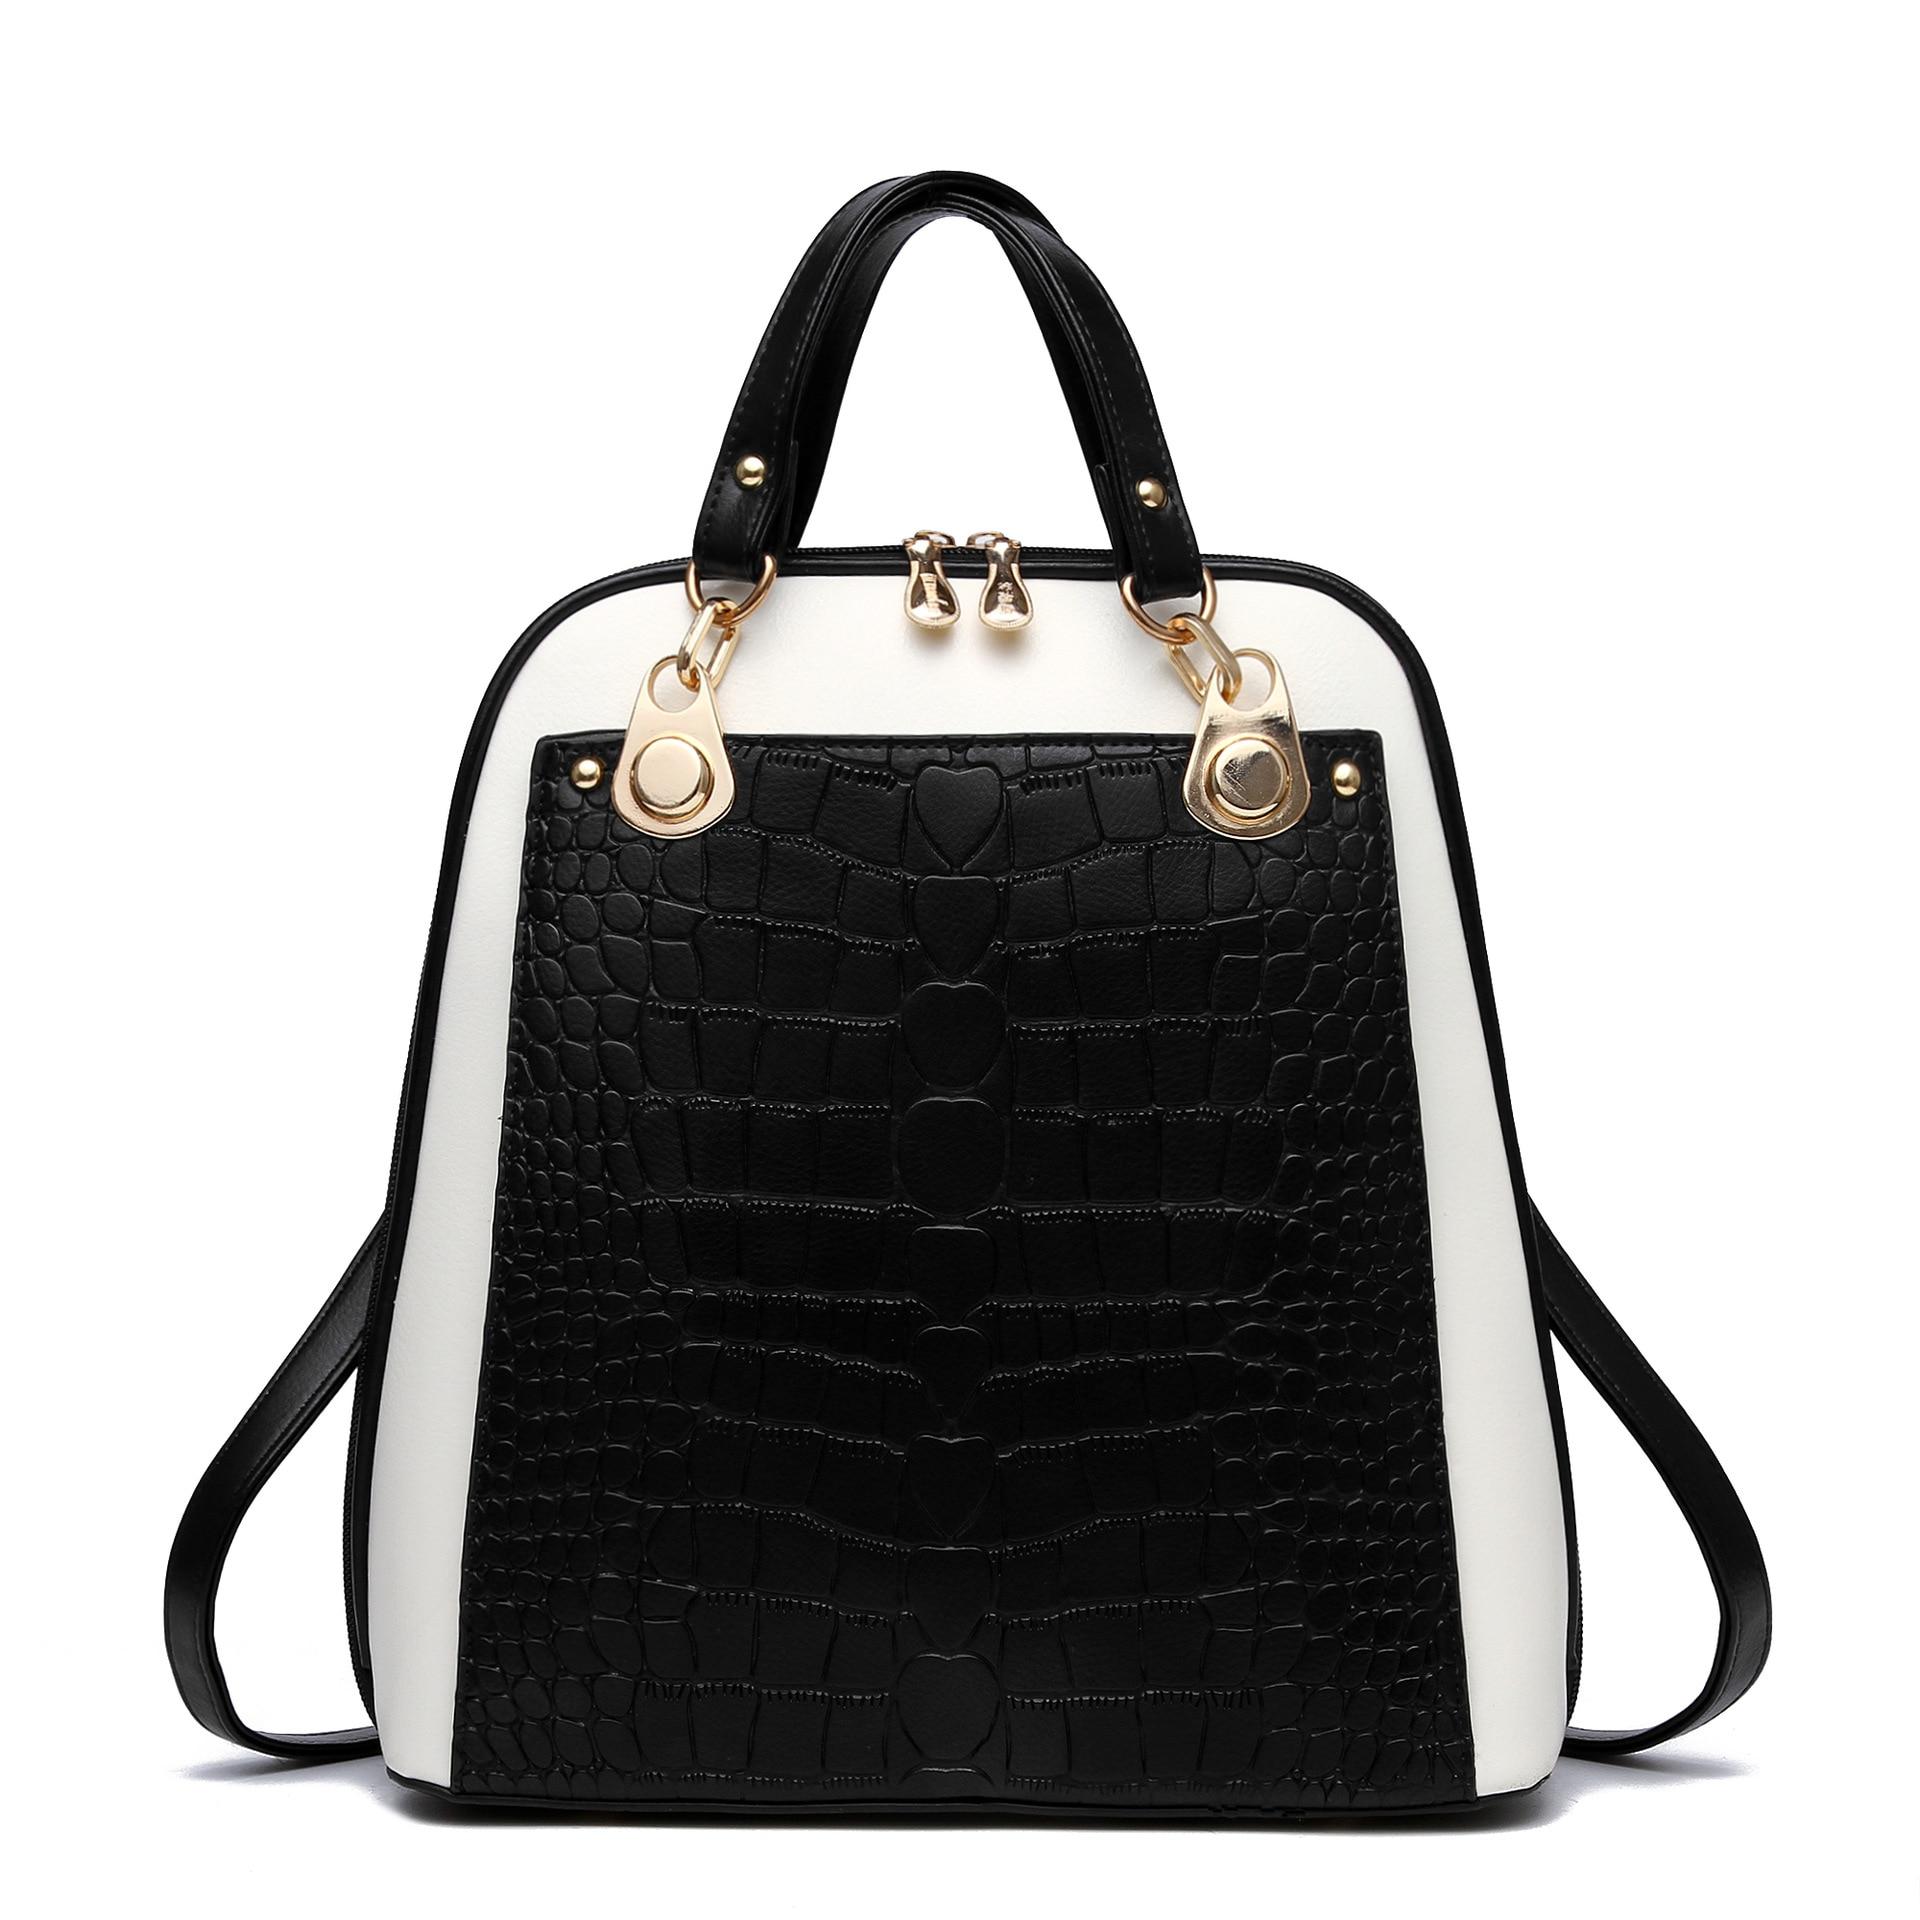 2016 Luxury Brand Backpack Alligator Women Female School Backpacks for Teenage Girls Mochila Mujer Sac a Dos